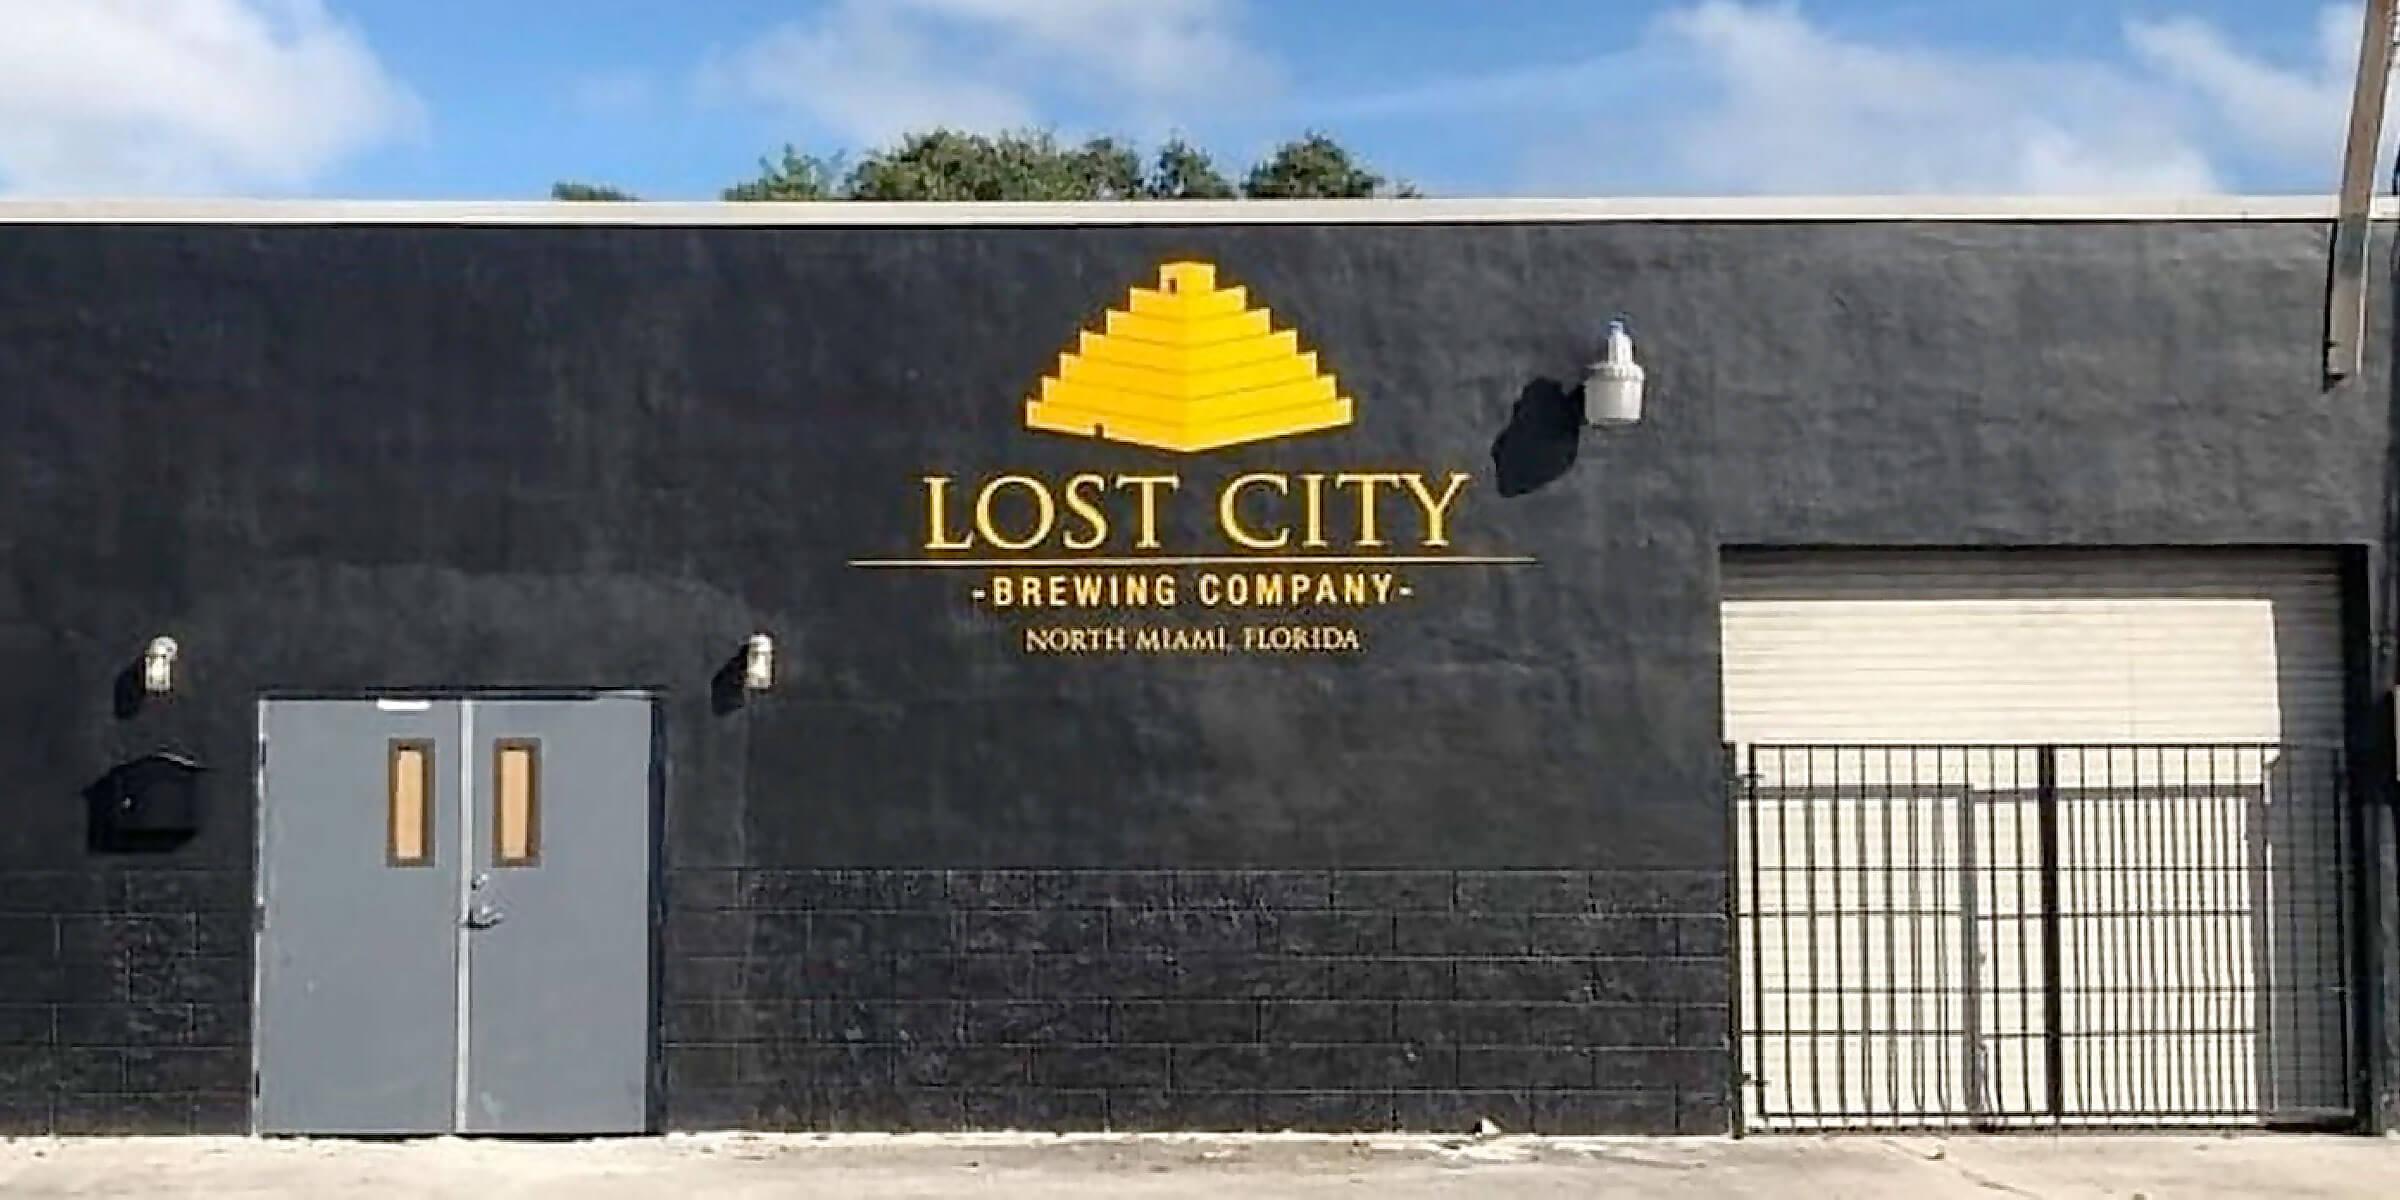 Outside the Lost City Brewing Company in North Miami, Florida